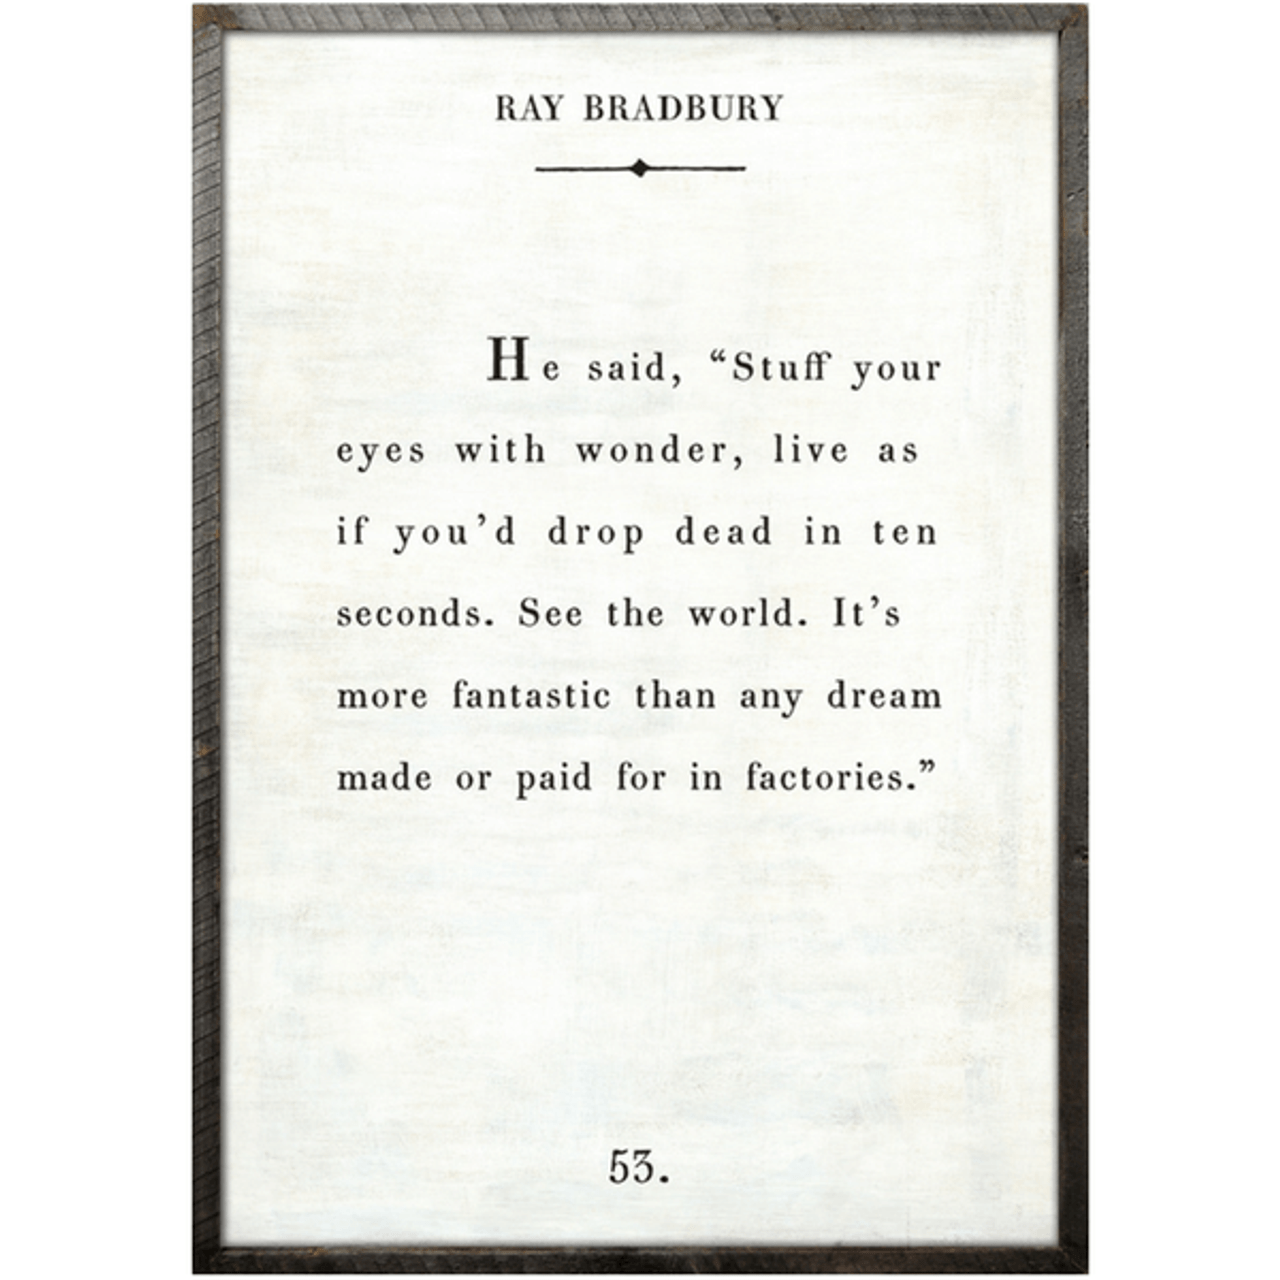 ray bradbury art print - white with grey wood frame